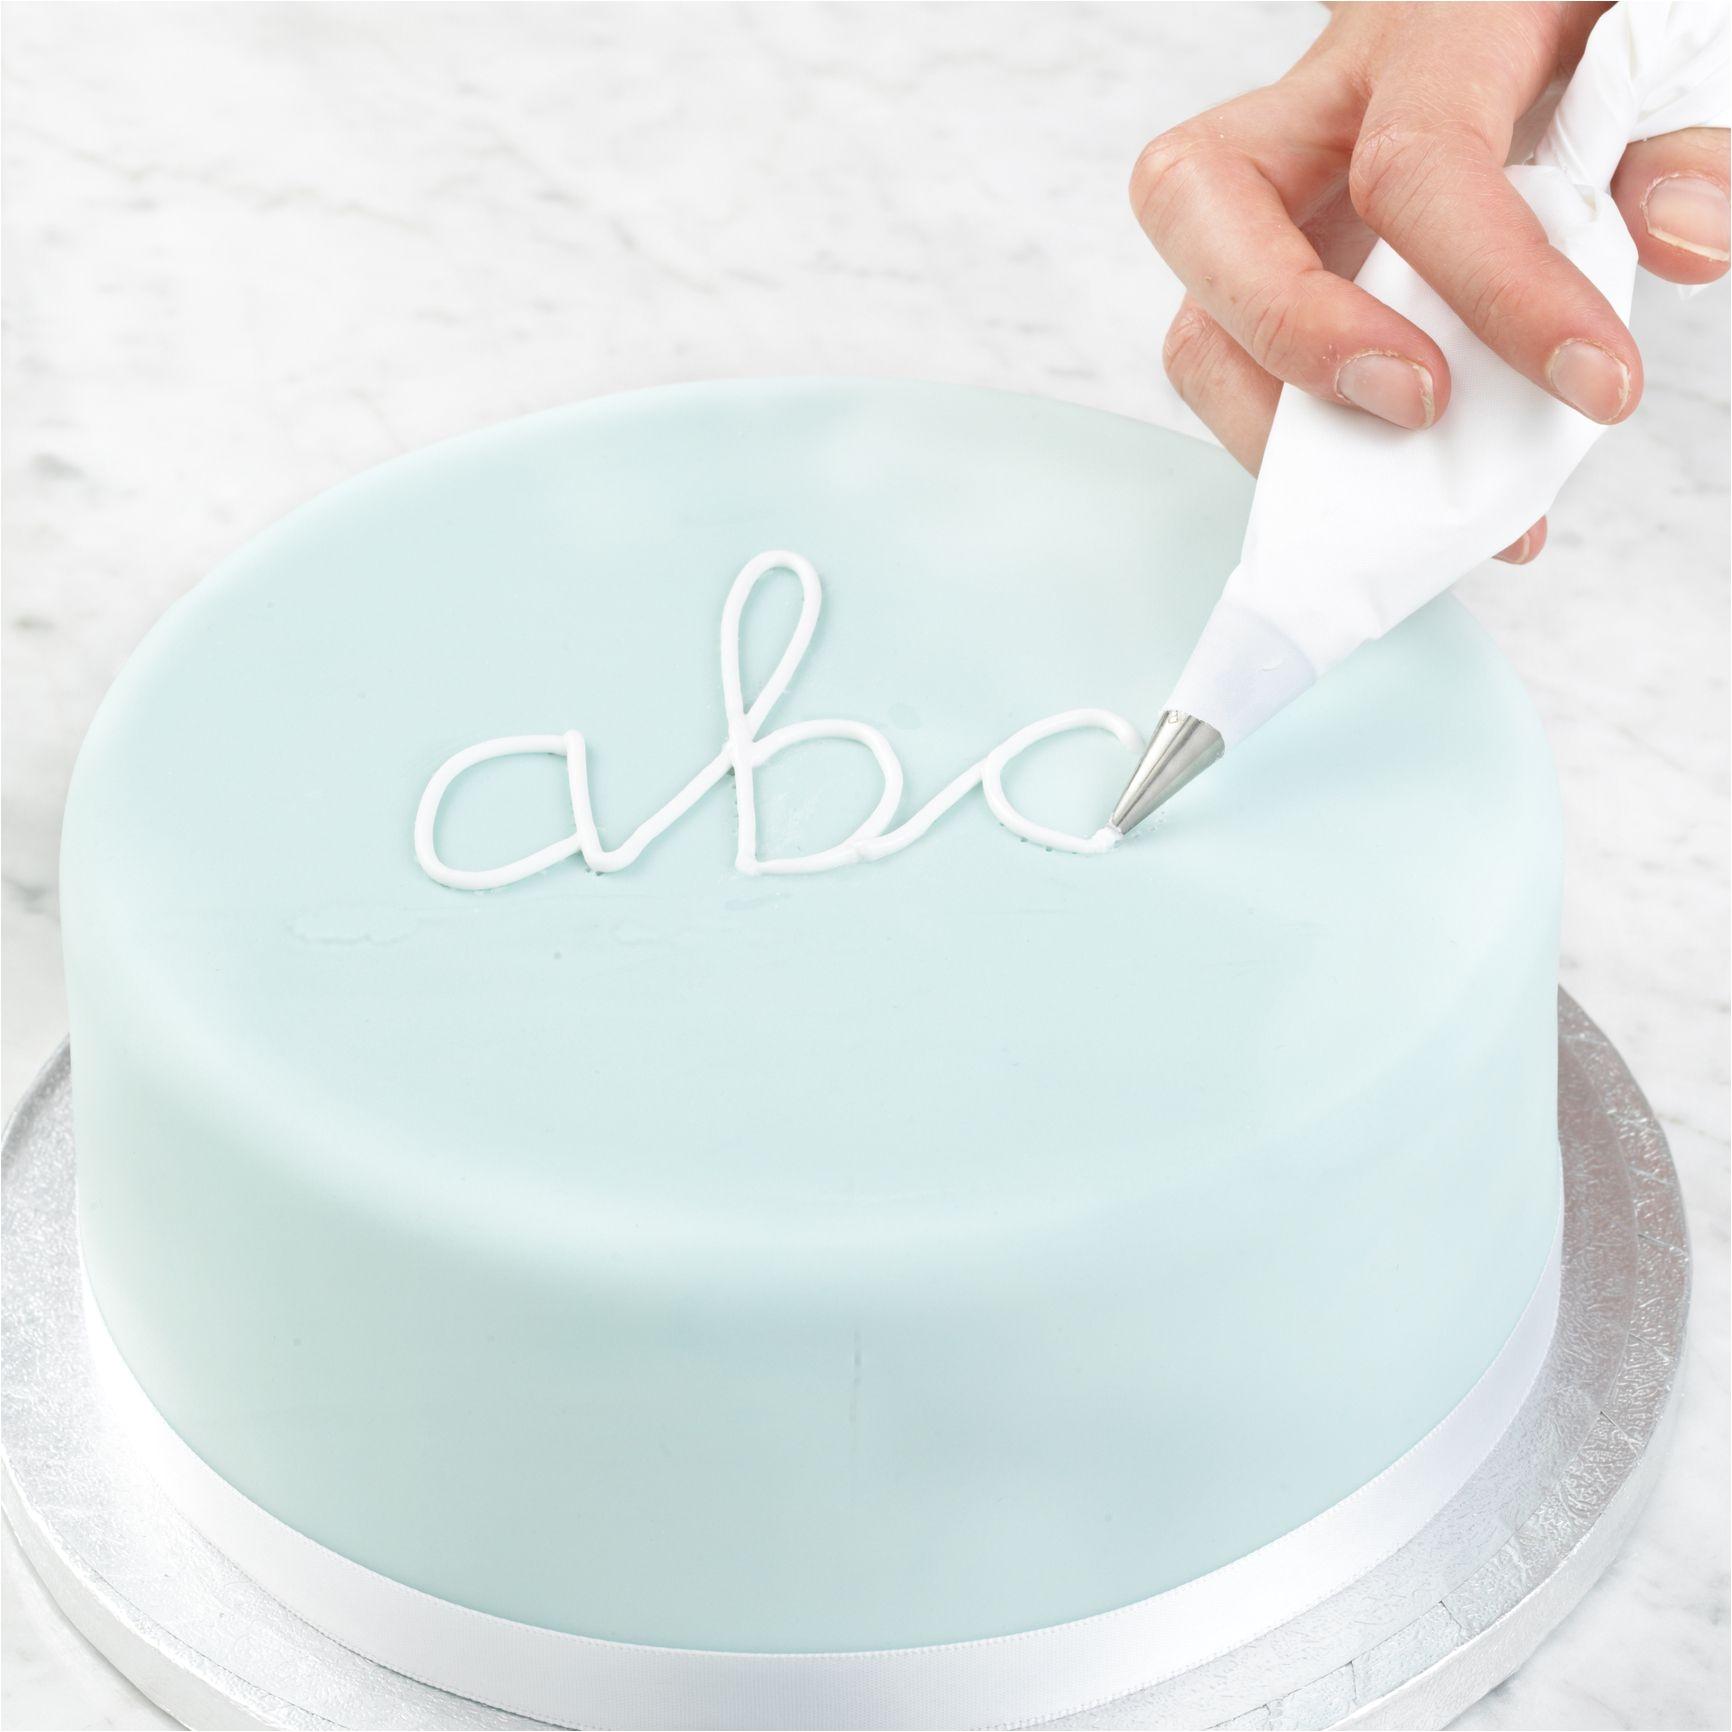 Advanced Cake Decorating Classes Near Me Basic Cake Decorating Videos